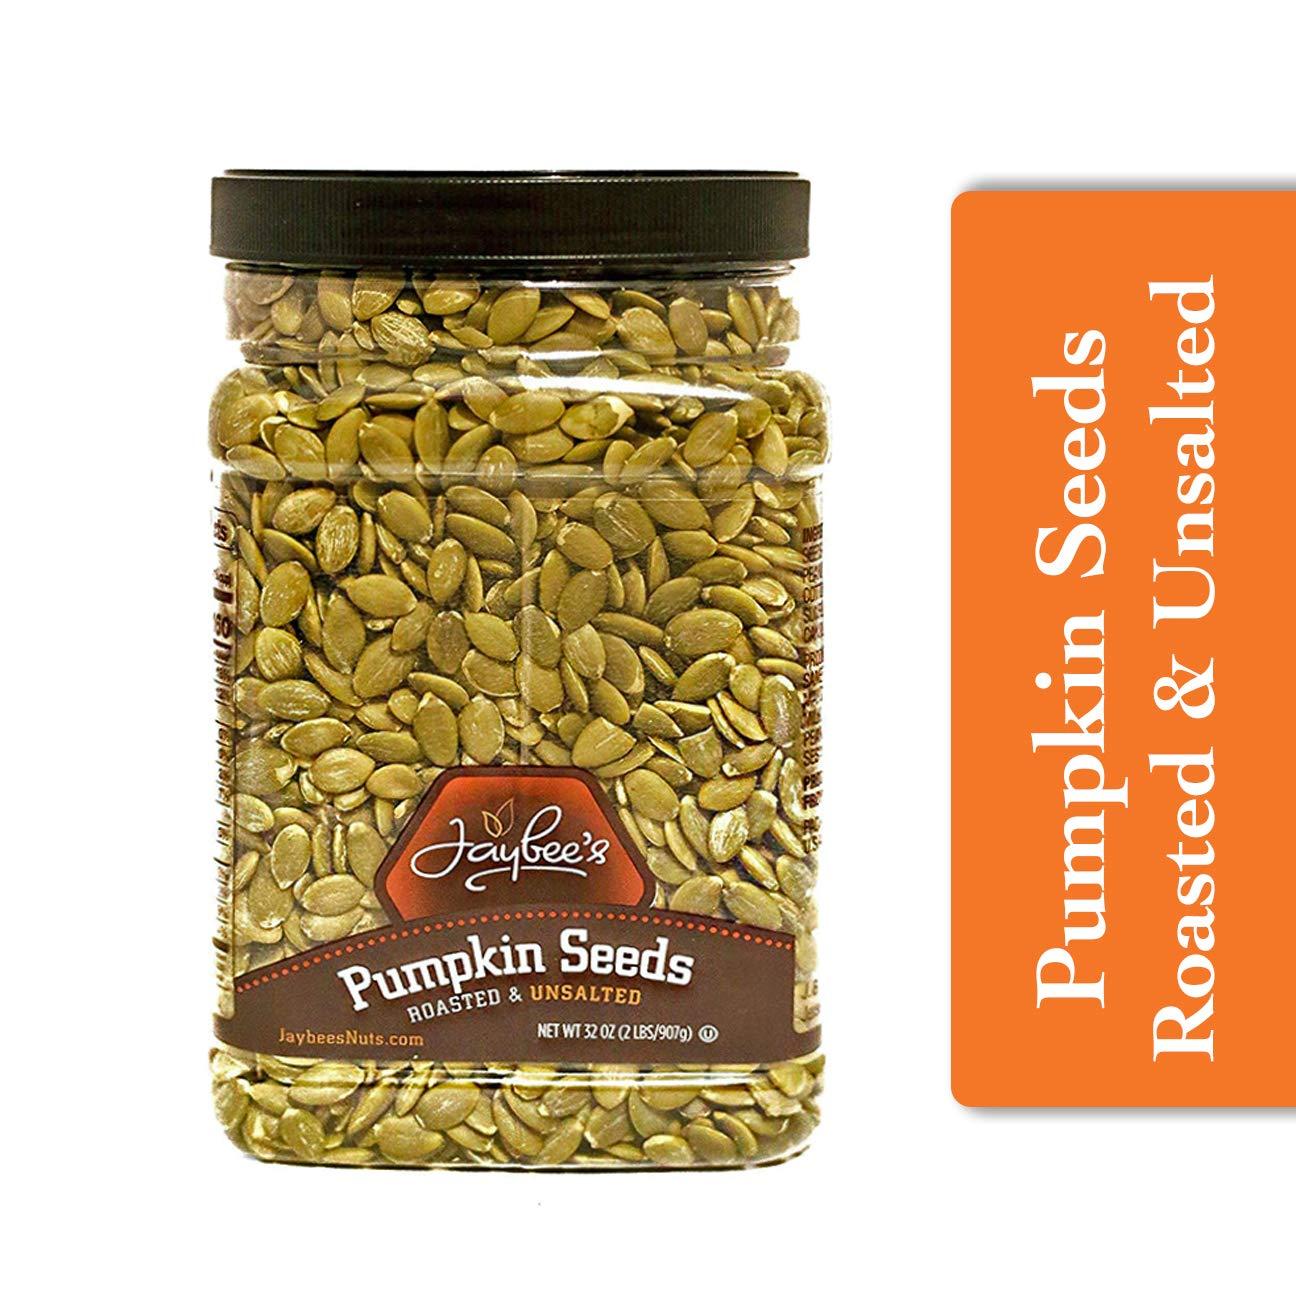 Jaybee's Nuts Pumpkin Seeds Pepitas - Roasted Unsalted (2 LBS) Fresh, Vegetarian, Vegan Friendly, Gluten Free, Keto Snack & Kosher Certified -Great Healthy Everyday Snack - Reusable Container